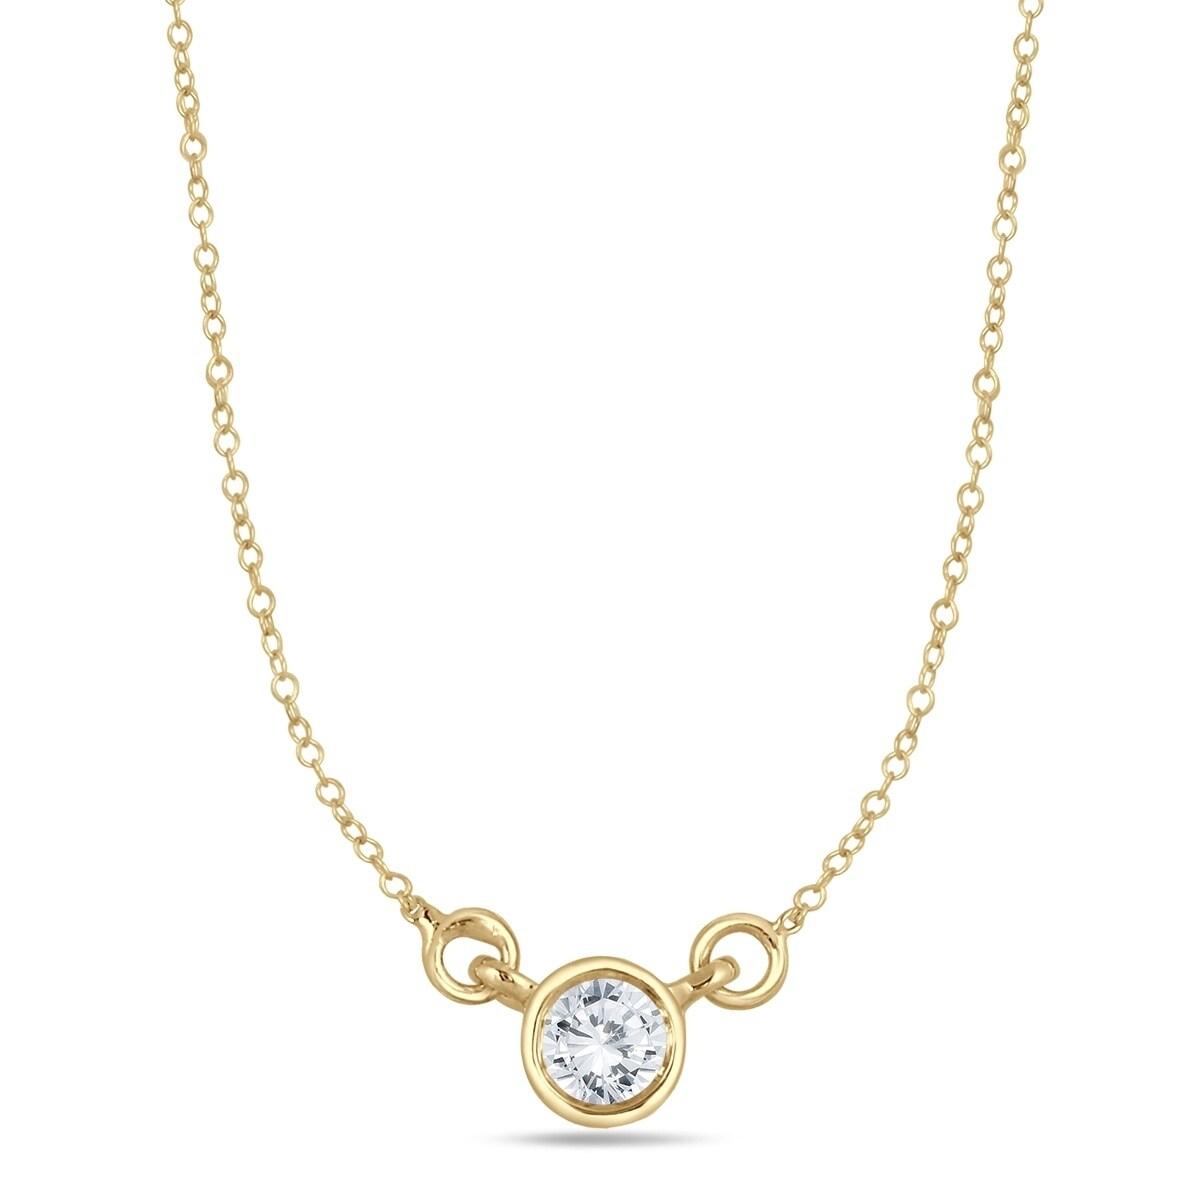 14 carat diamond bezel pendant in 14k yellow gold free shipping 14 carat diamond bezel pendant in 14k yellow gold free shipping today overstock 26572571 aloadofball Choice Image